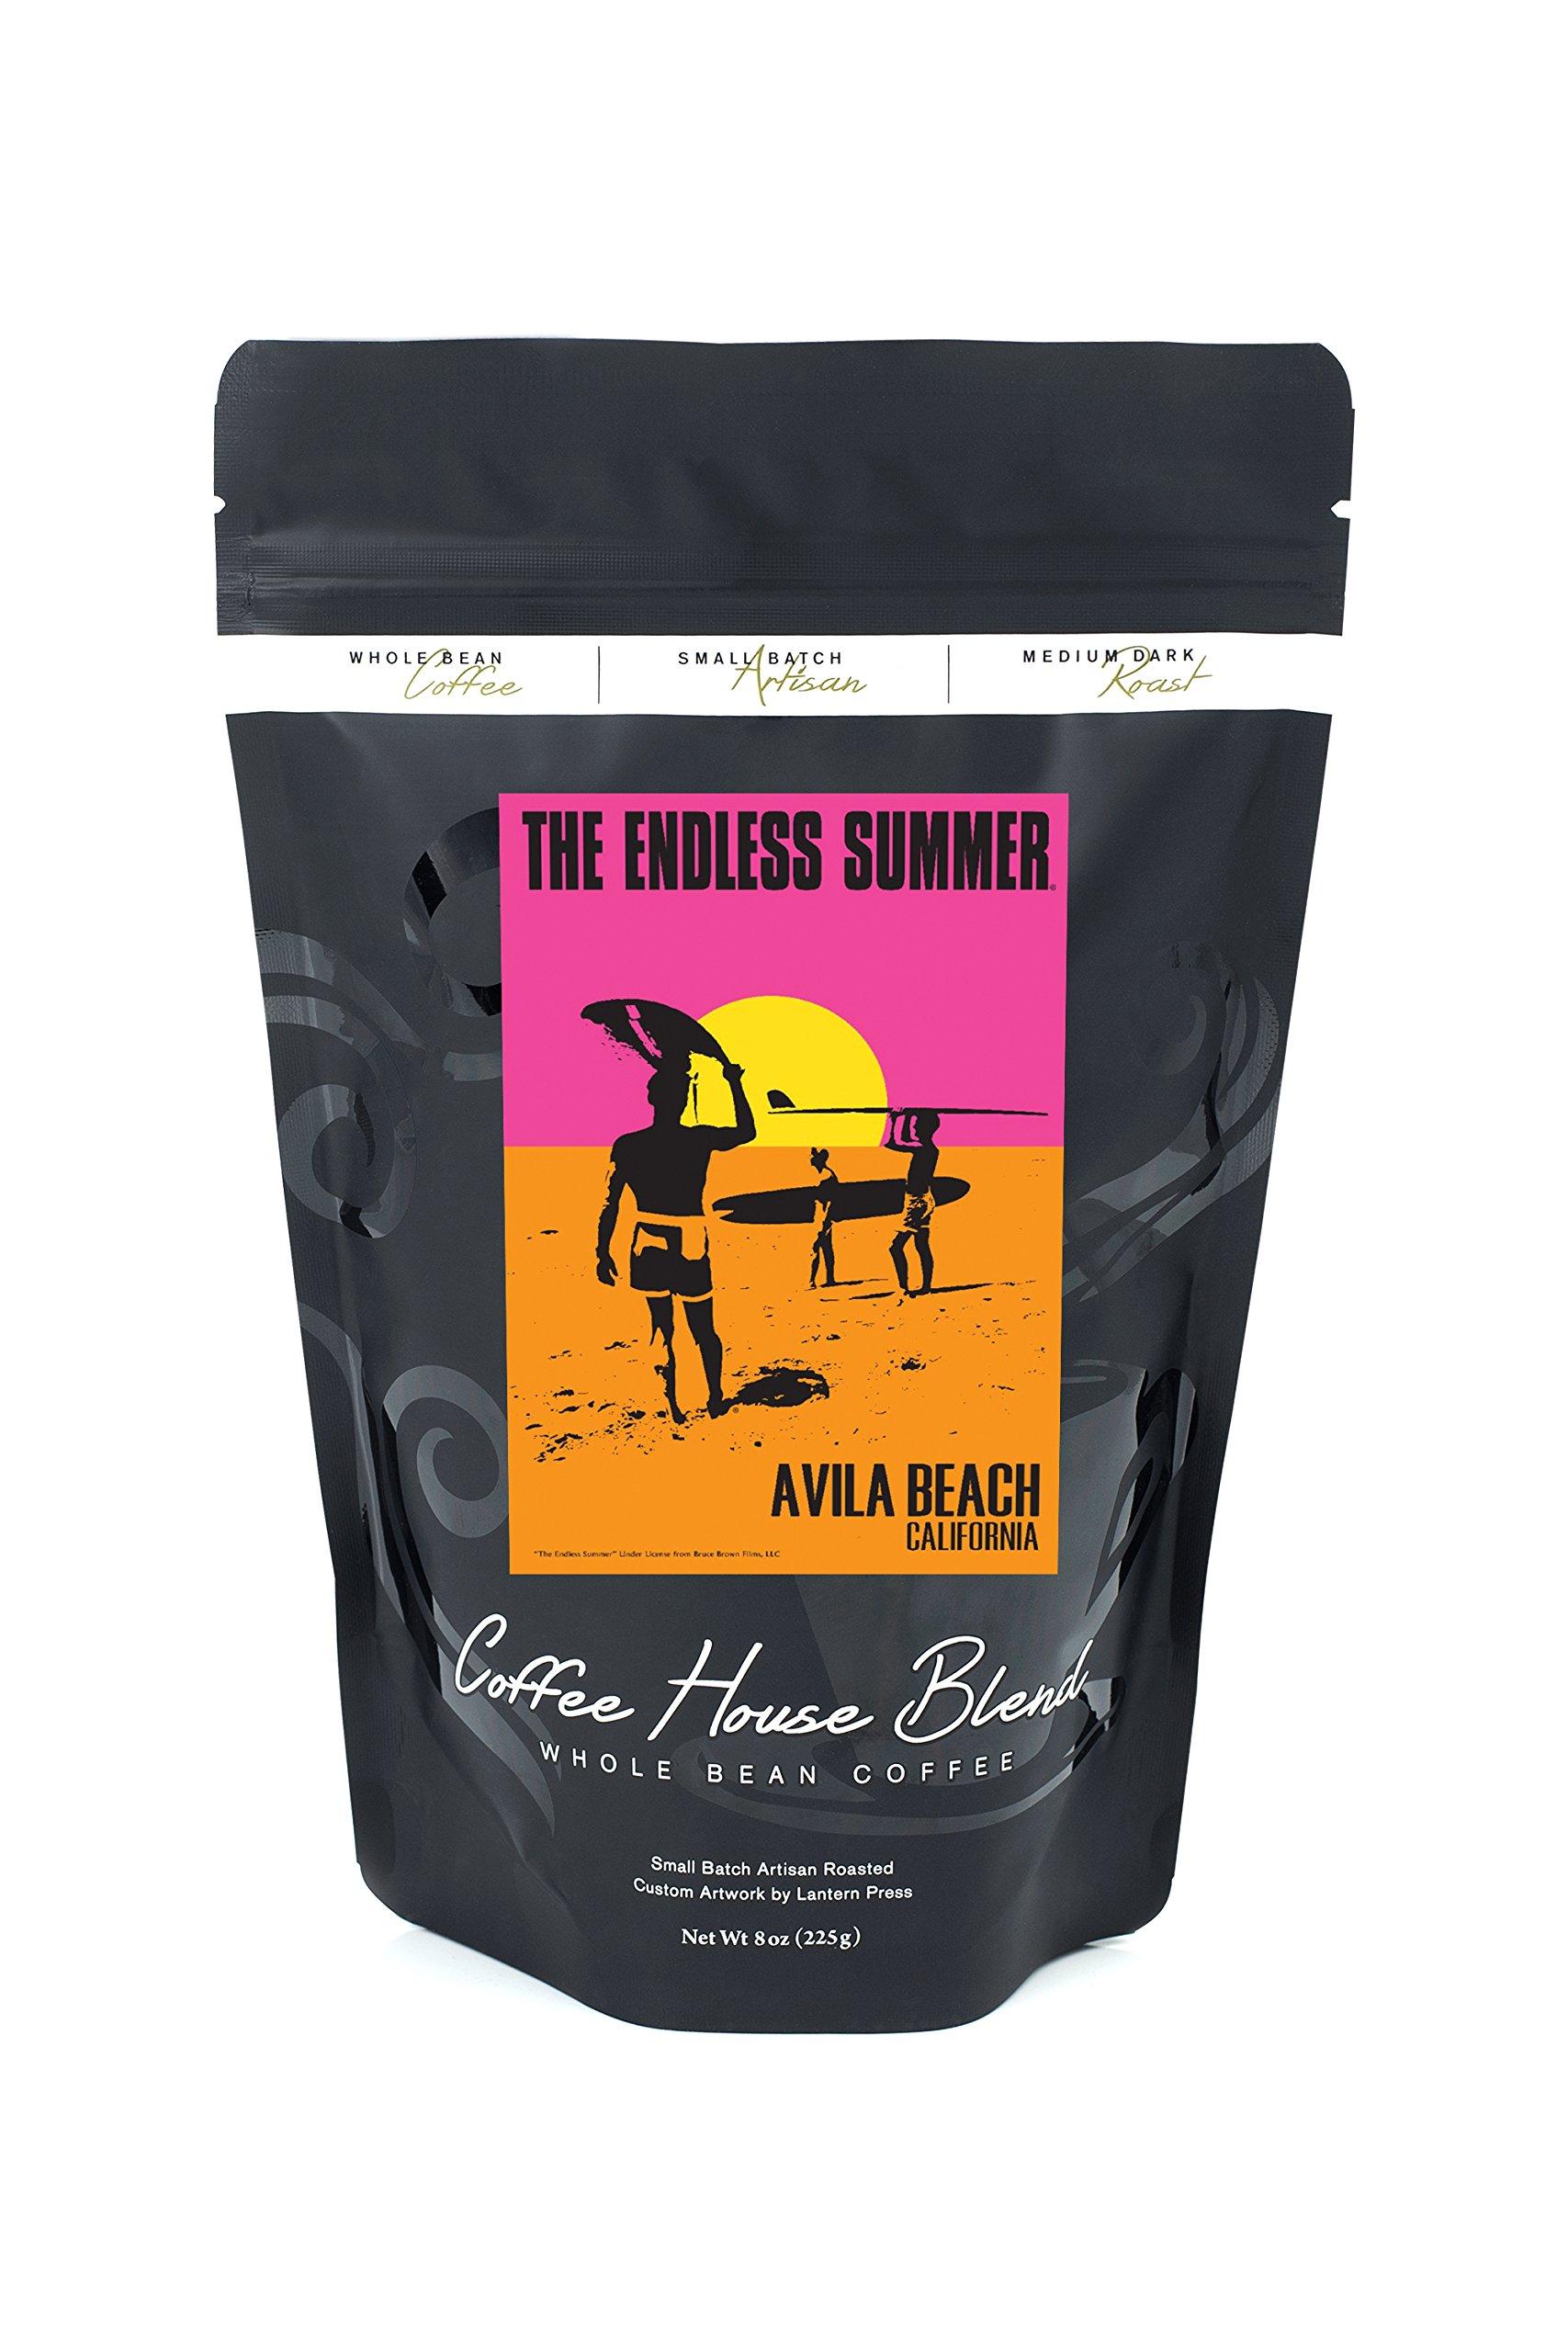 Avila Beach, California - The Endless Summer - Original Movie Poster (8oz Whole Bean Small Batch Artisan Coffee - Bold & Strong Medium Dark Roast w/ Artwork)